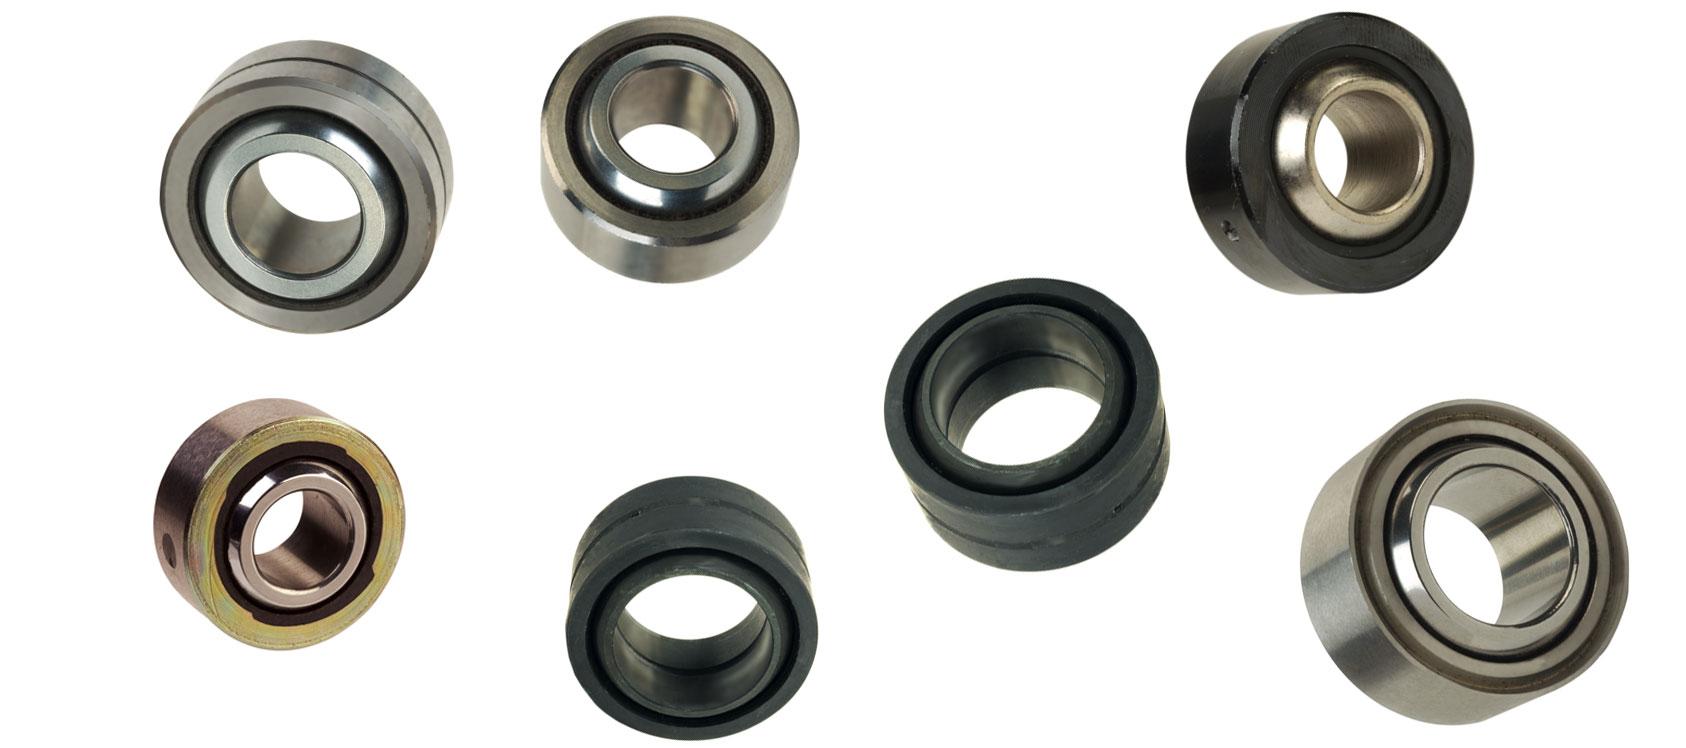 Cablecraft Spherical Bearings